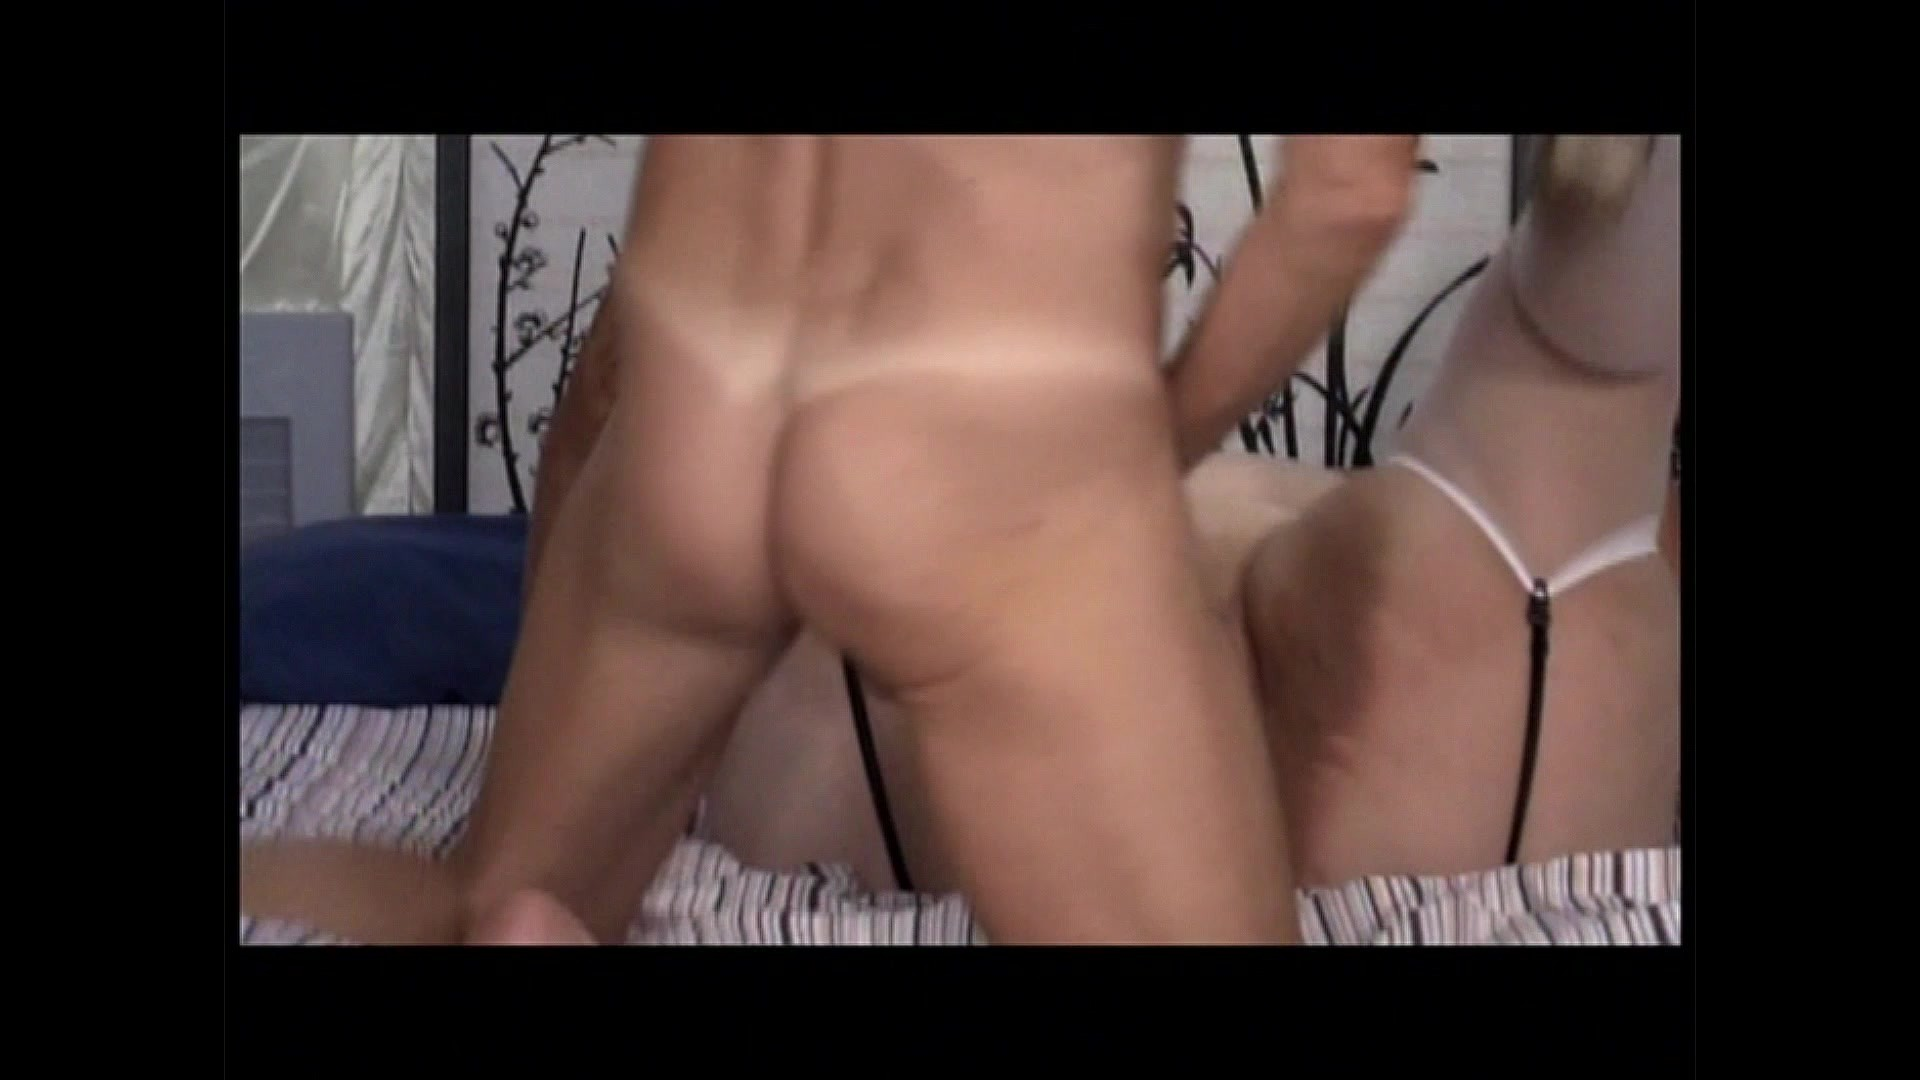 XXX Image Highest rated pornstar